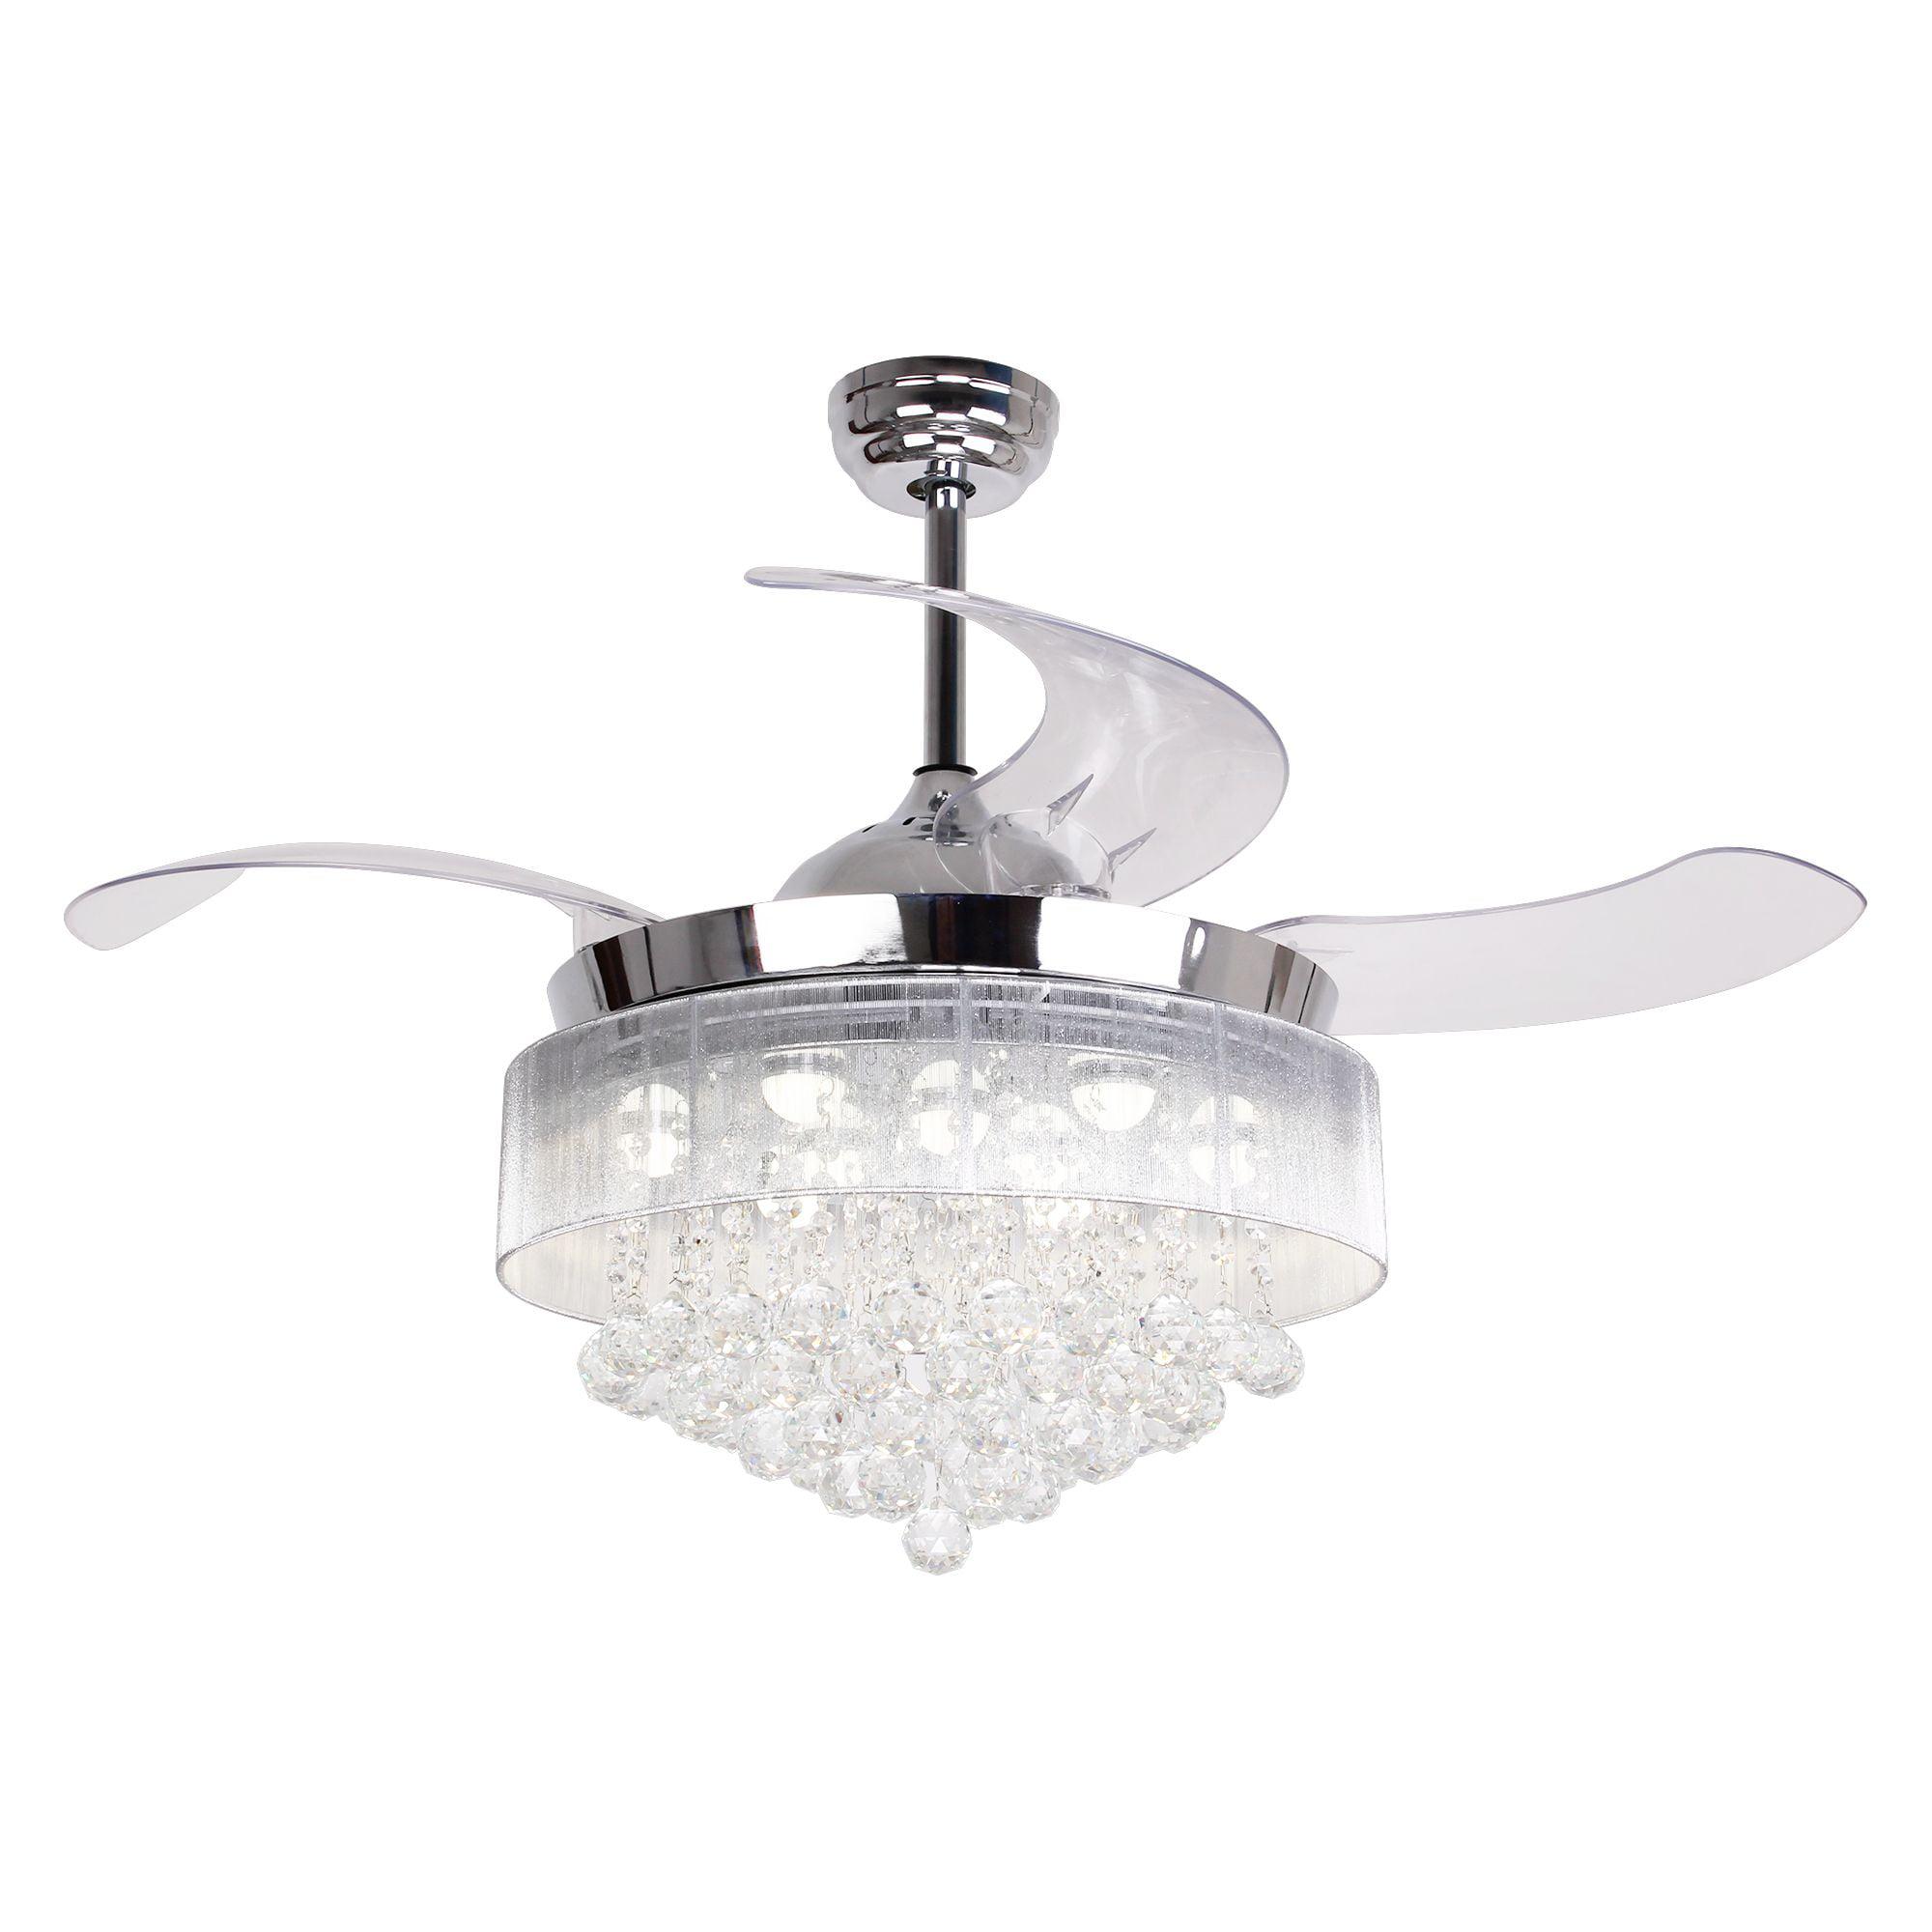 Modern Led Ceiling Fan Retractable